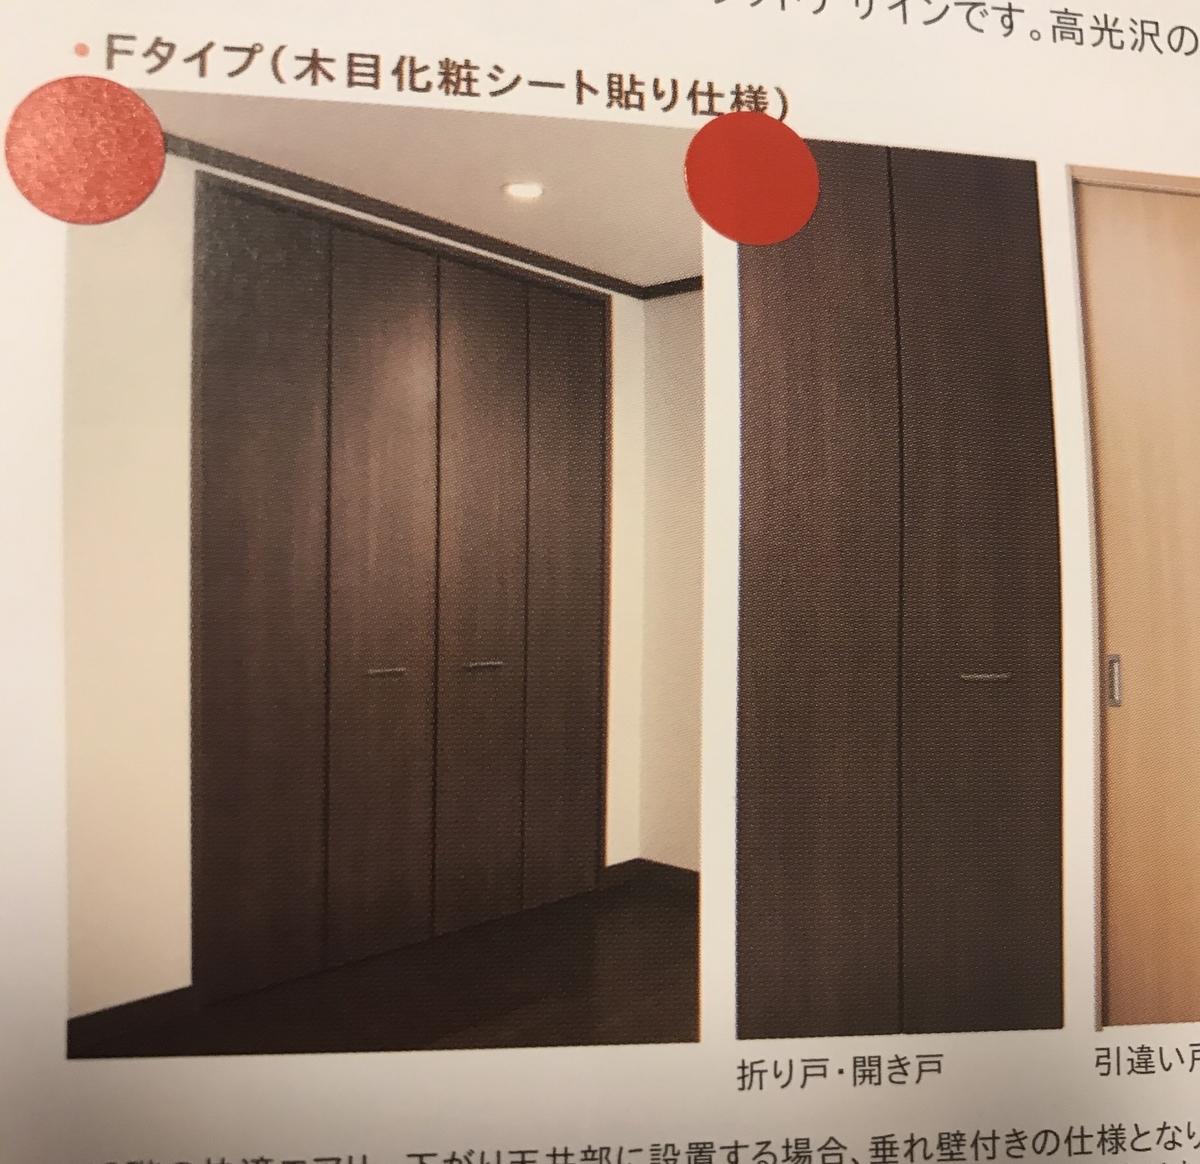 f:id:kinako_0128:20200121222040j:plain